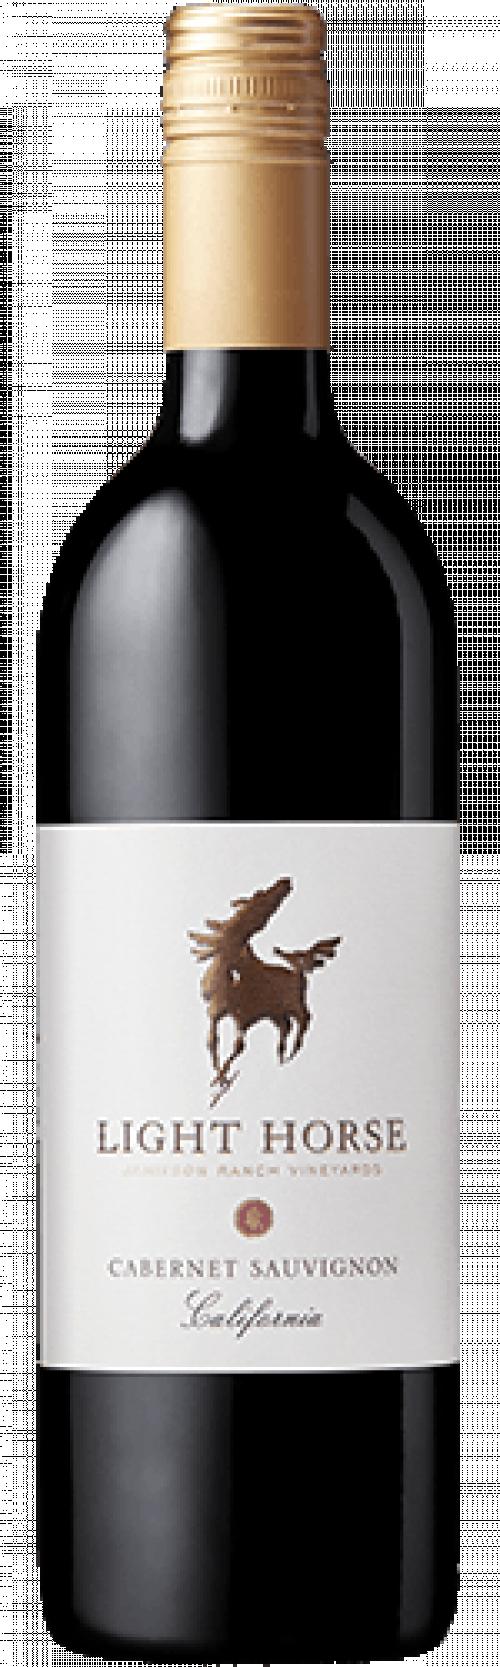 2017 Light Horse Cabernet Sauvignon 750ml